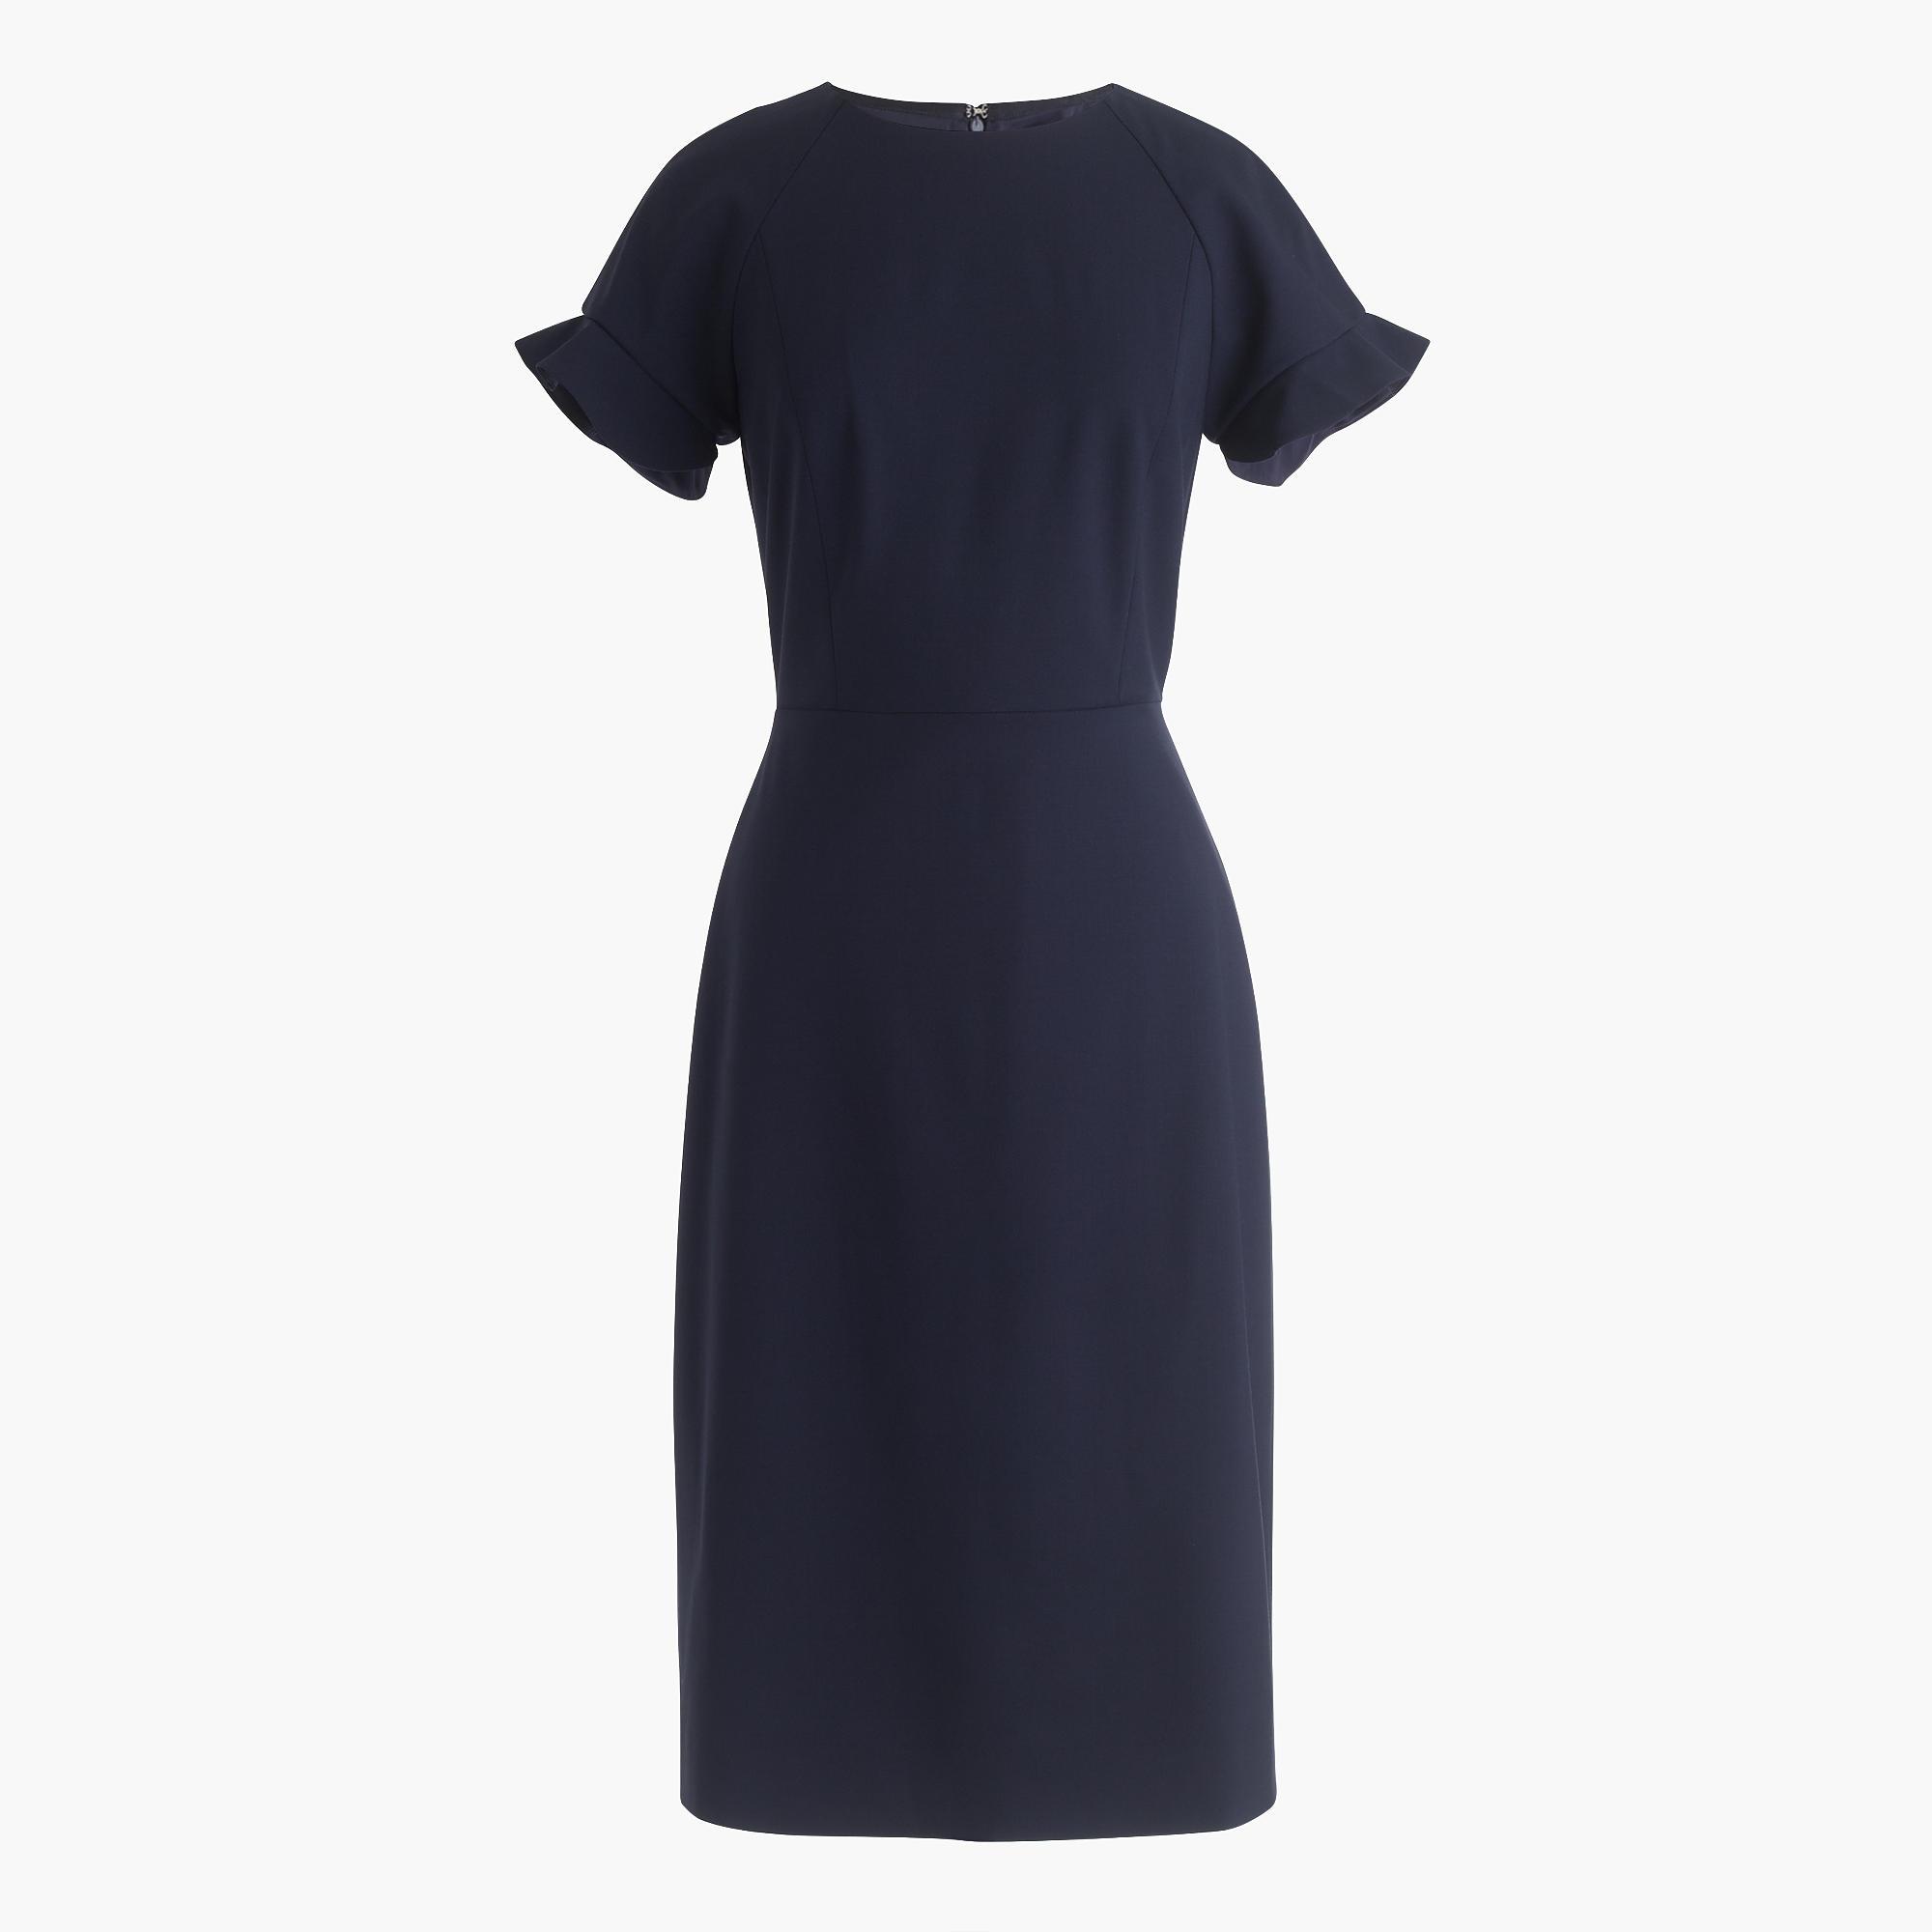 Ruffle-sleeve sheath dress in Italian stretch wool